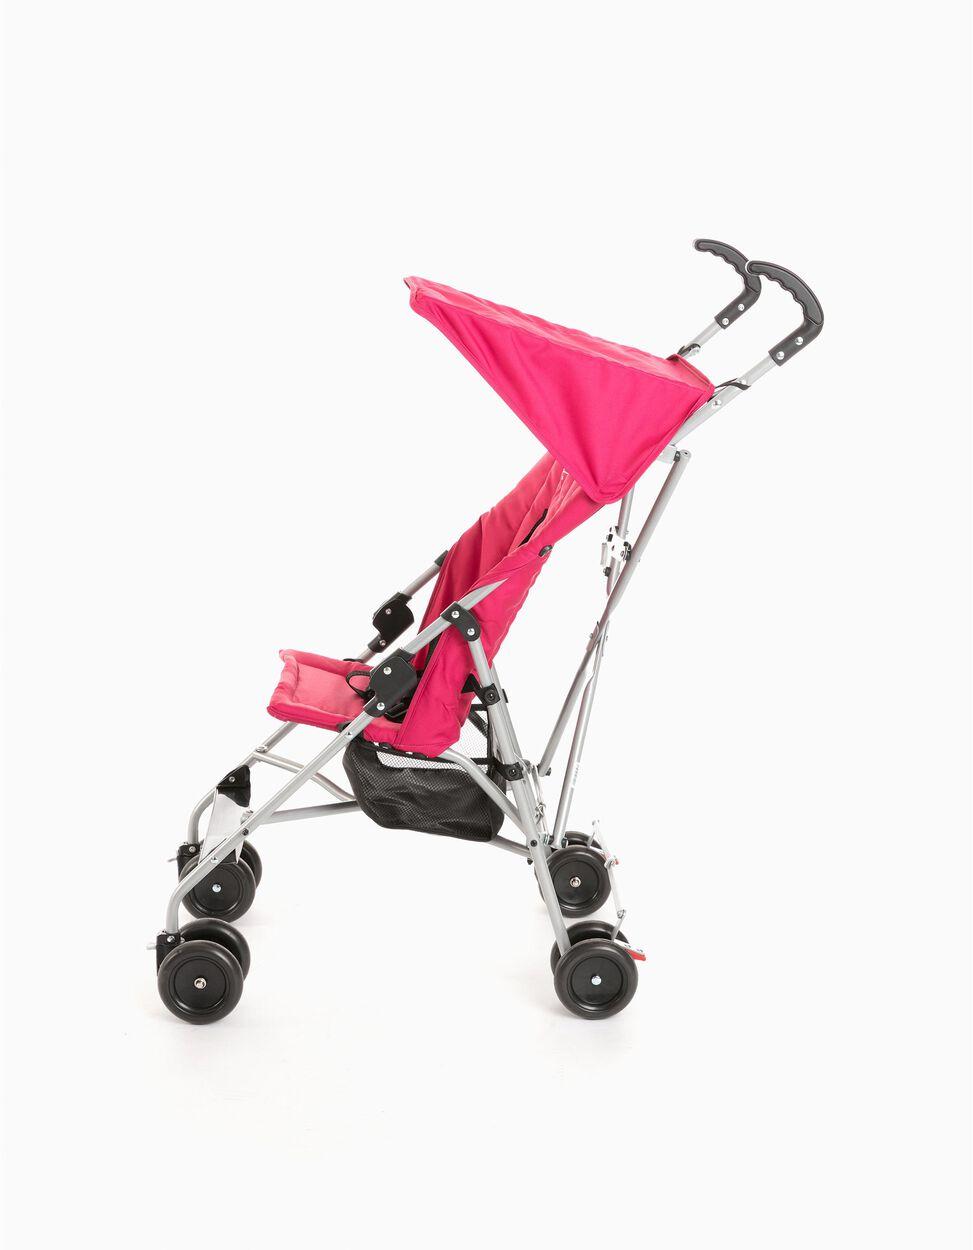 Carrinho Bengala Road Zy Safe Pink